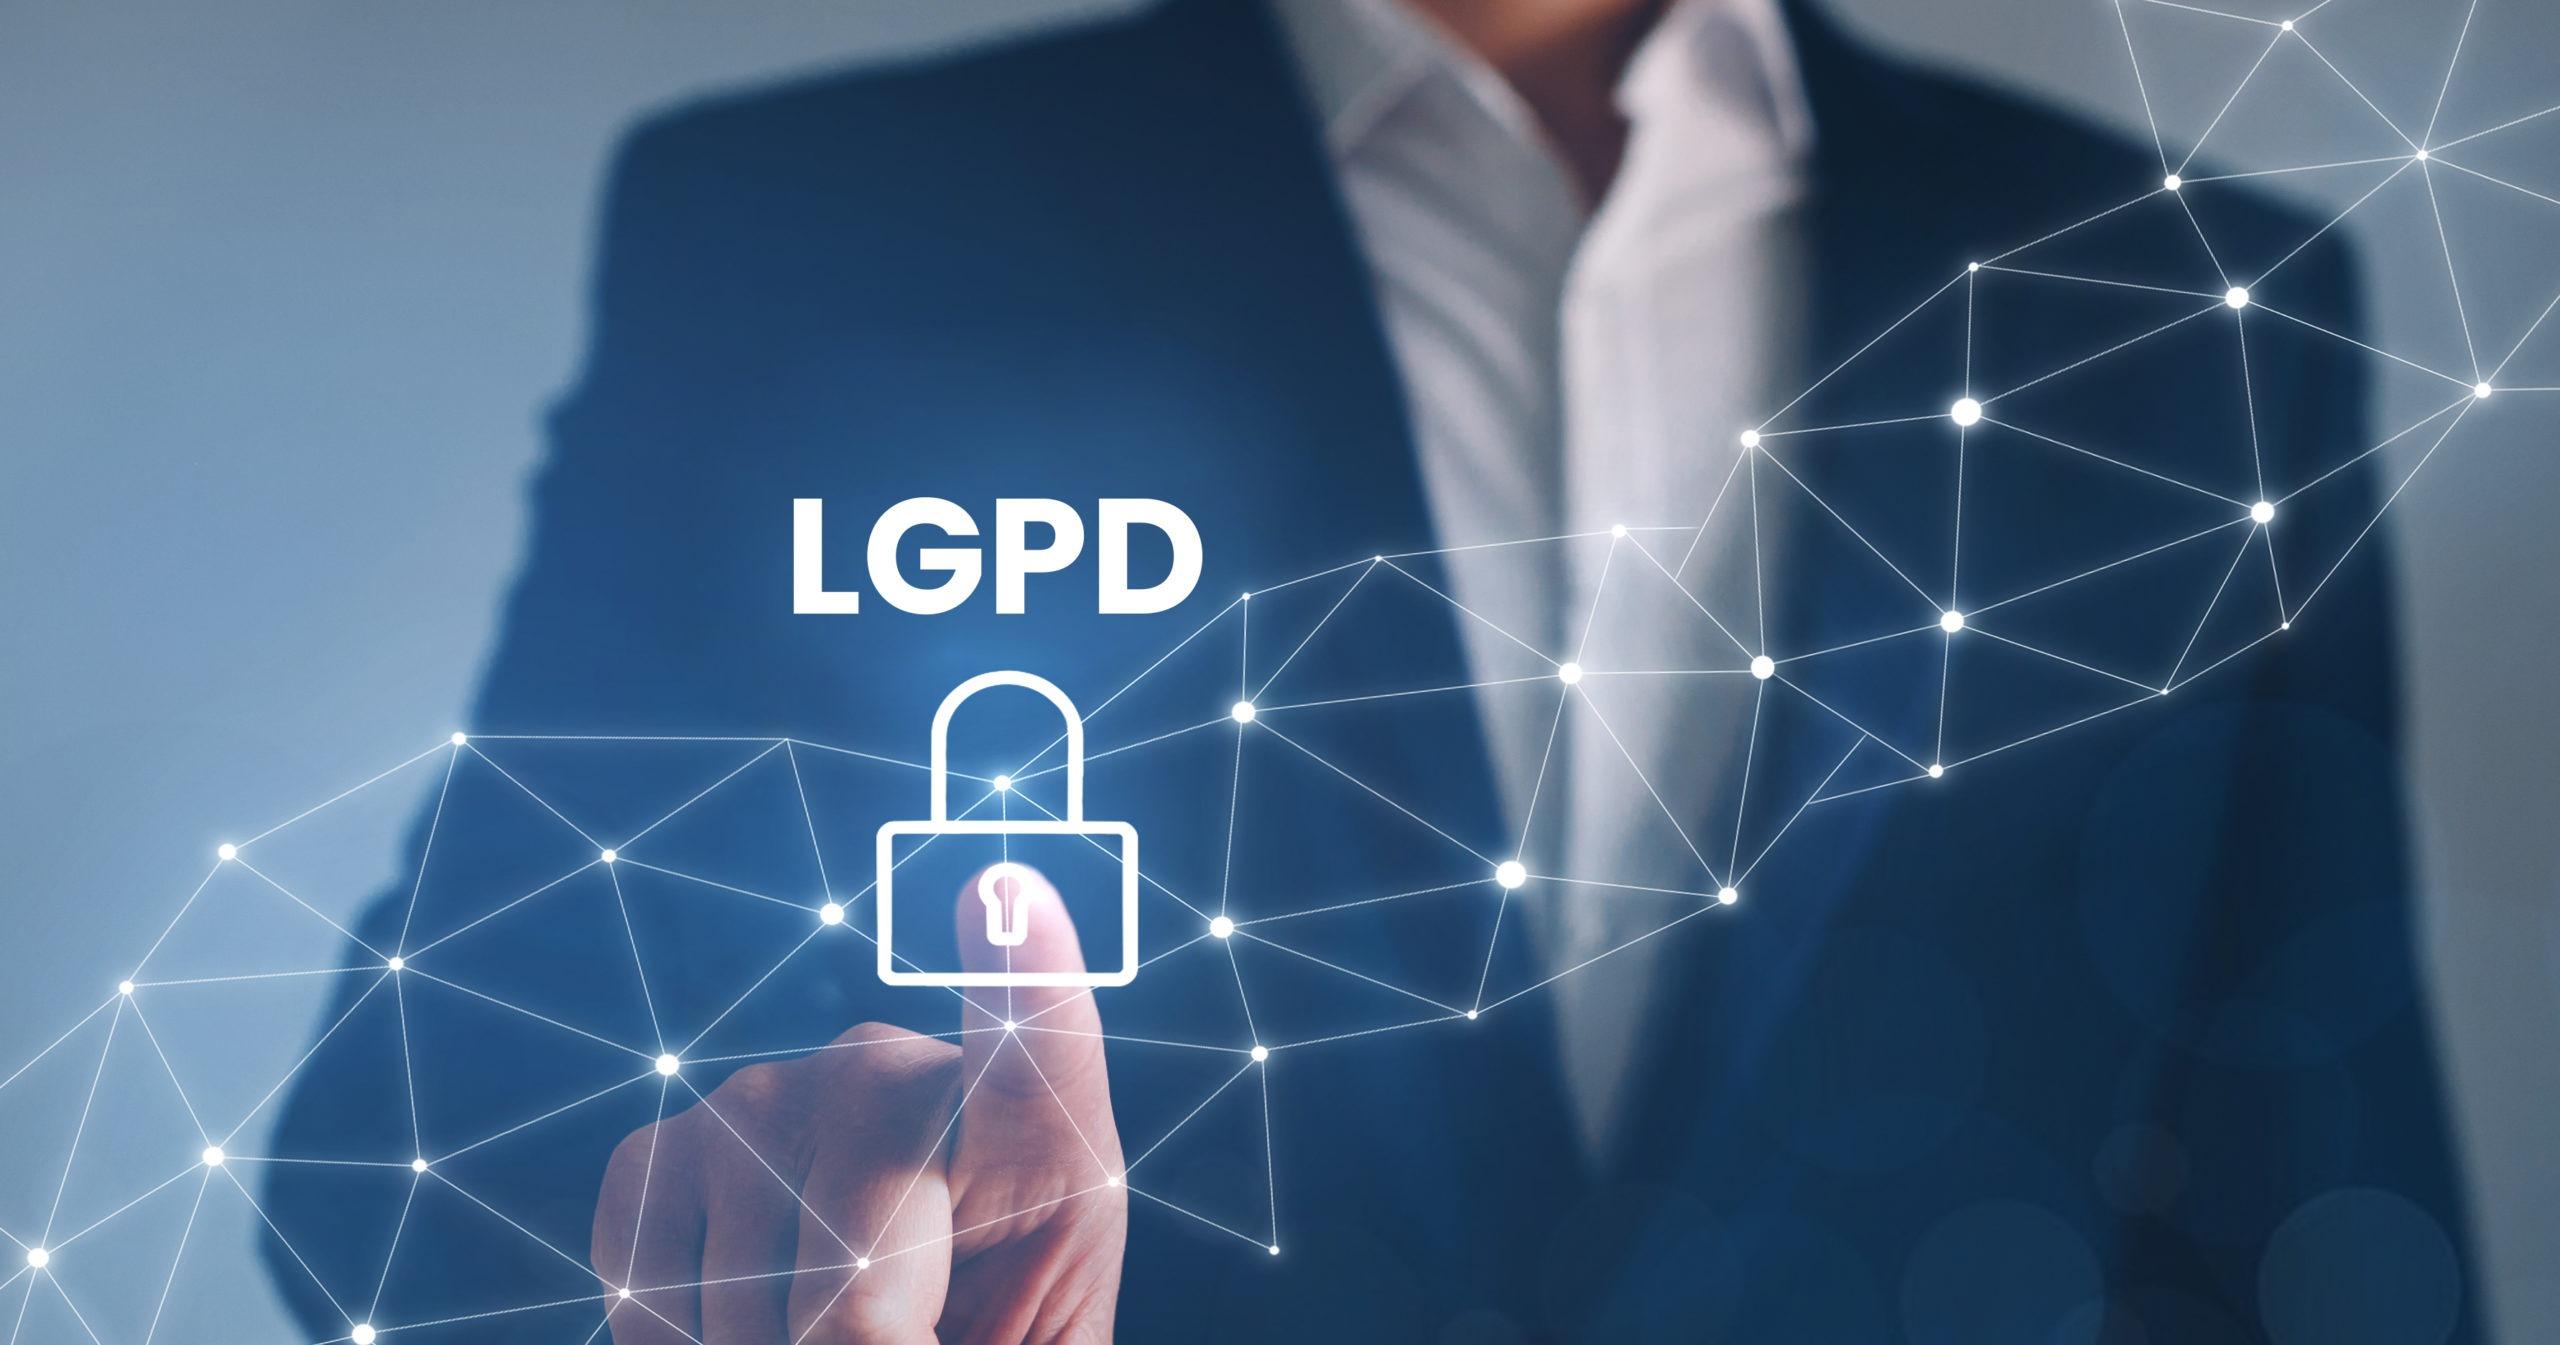 LGPD e a importância para os Detrans